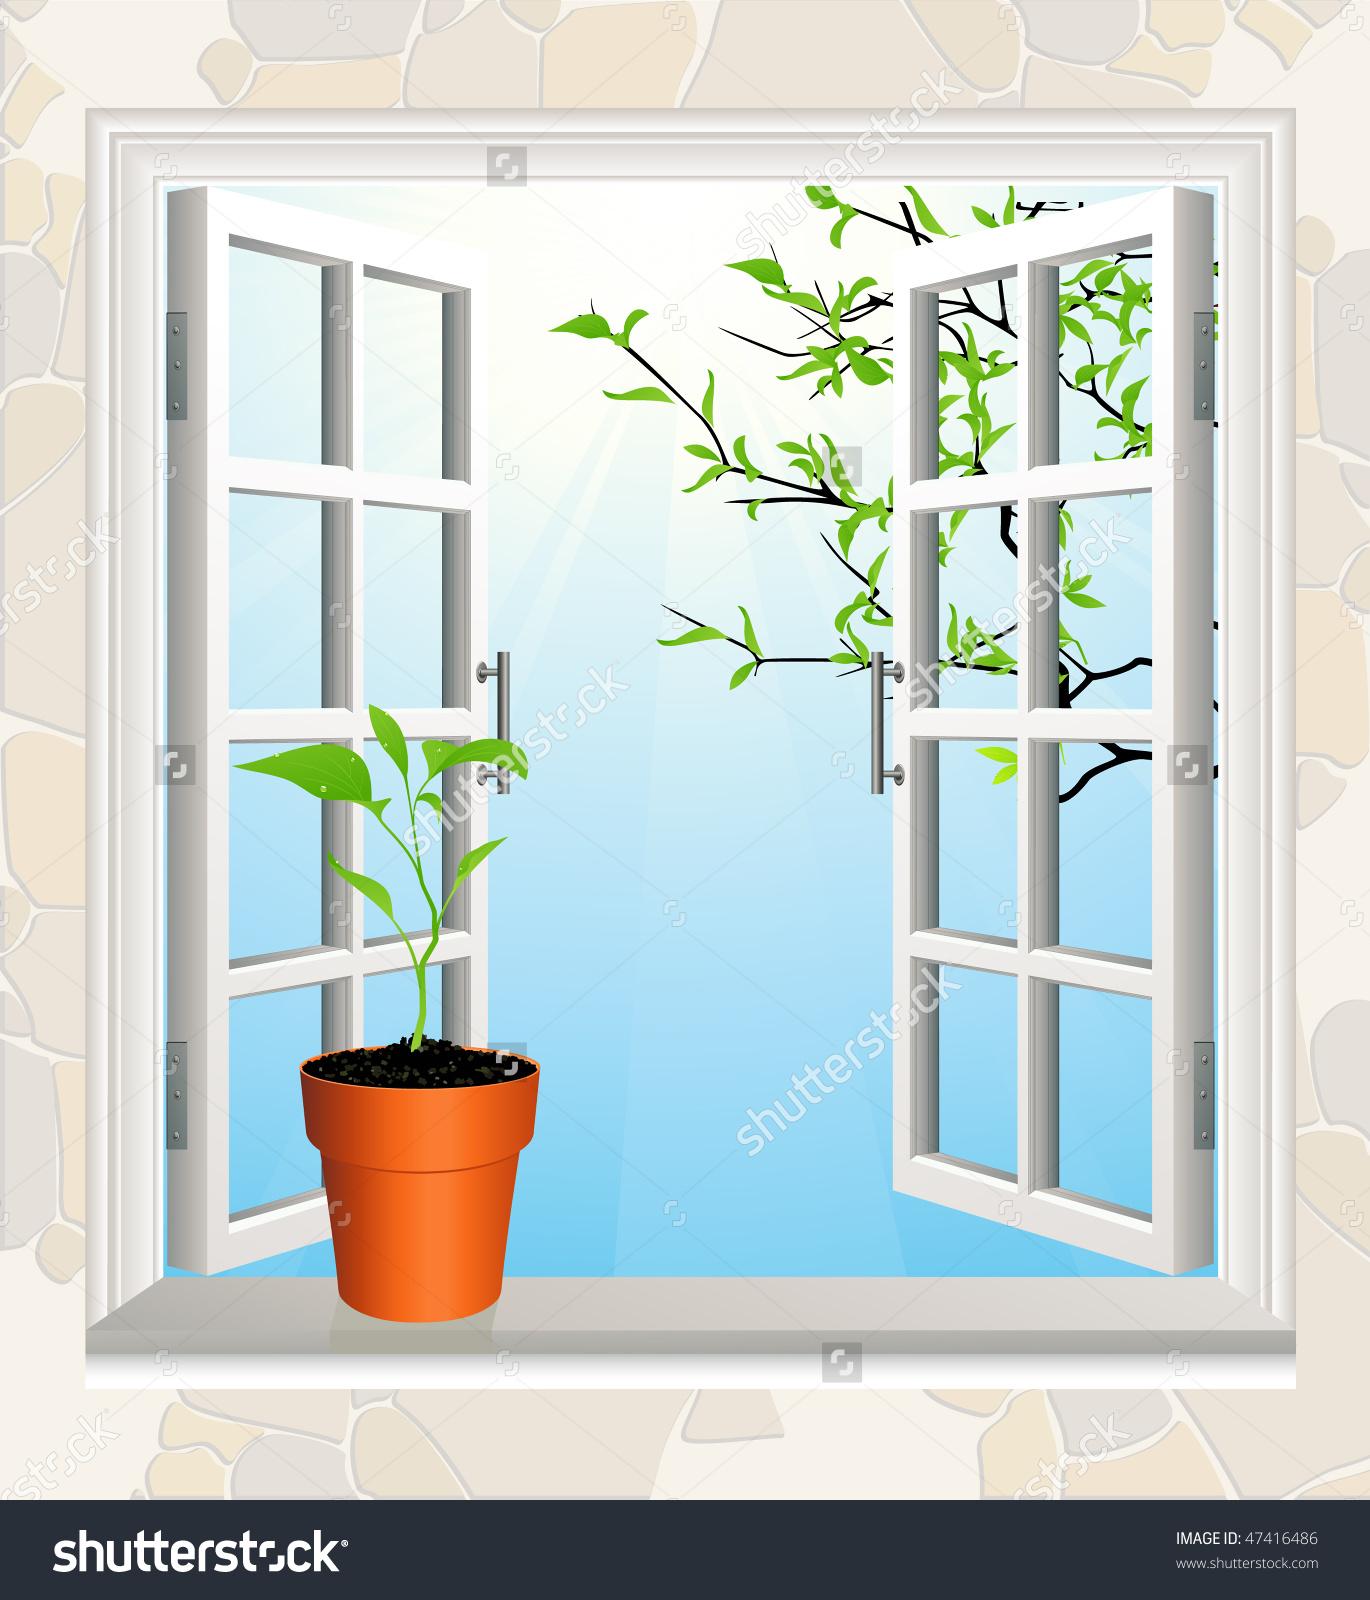 Window sill clipart.